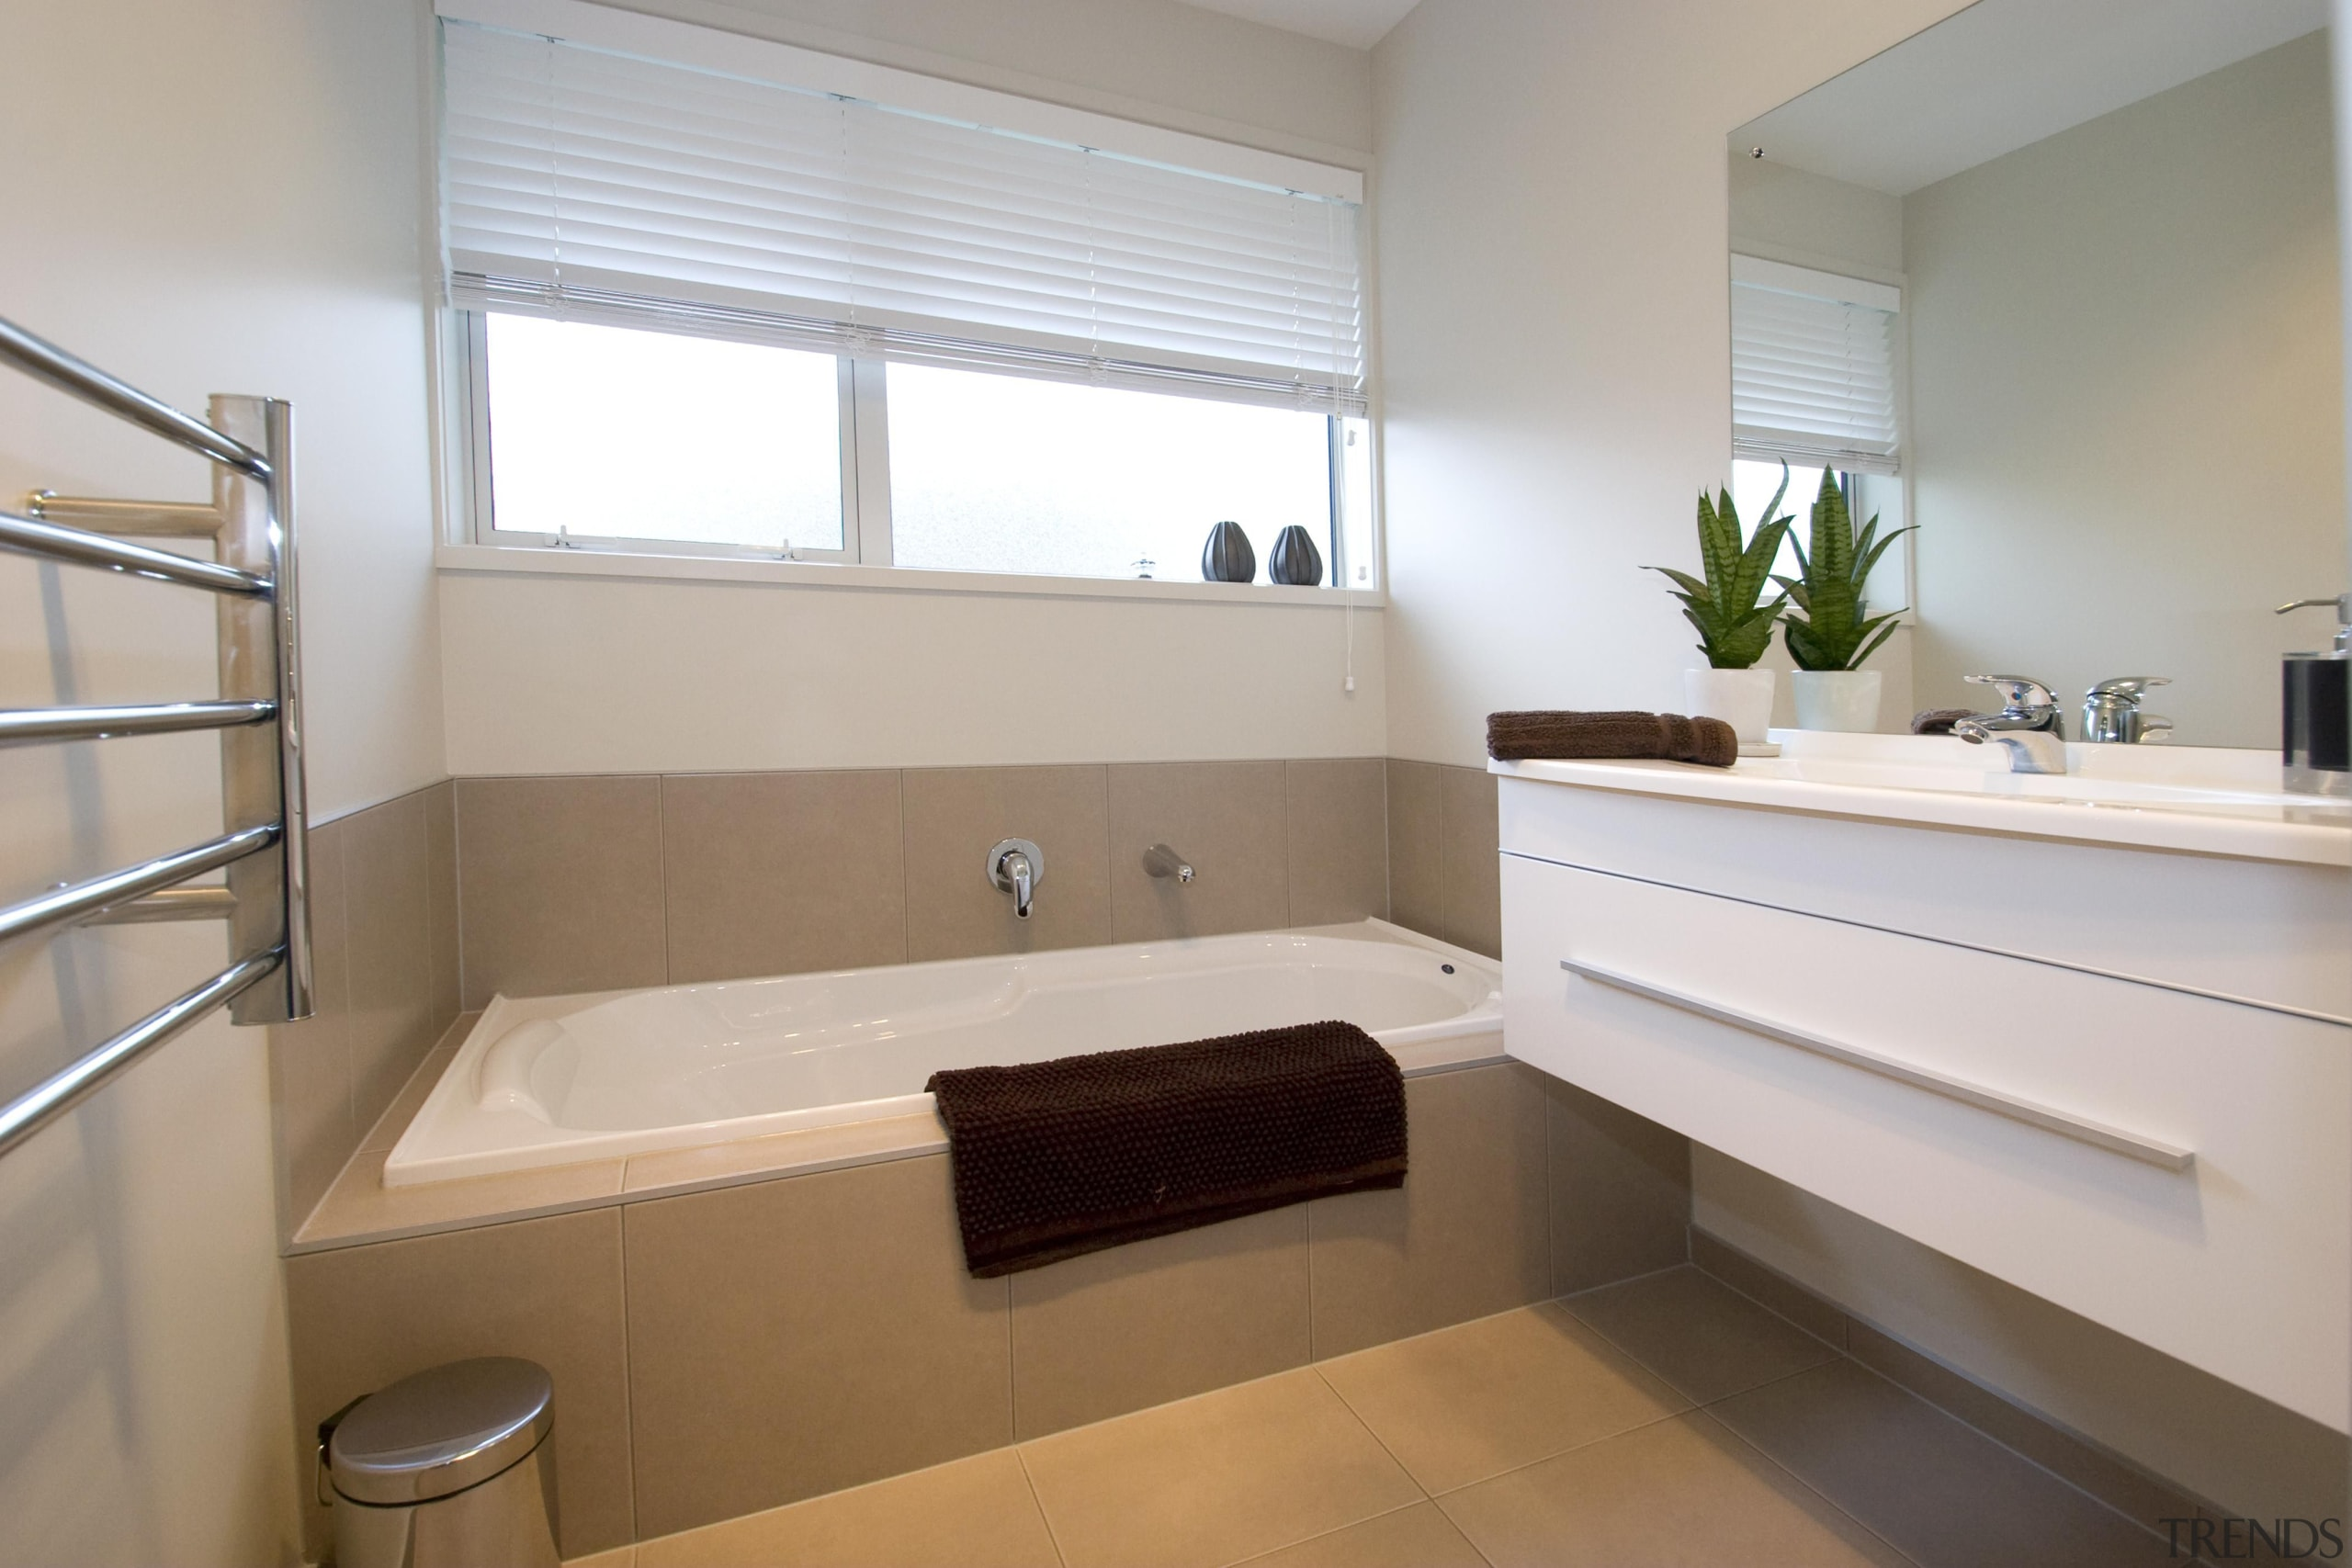 Bathroom ErhlerFor more information, please visit www.gjgardner.co.nz bathroom, floor, home, interior design, property, room, sink, window, gray